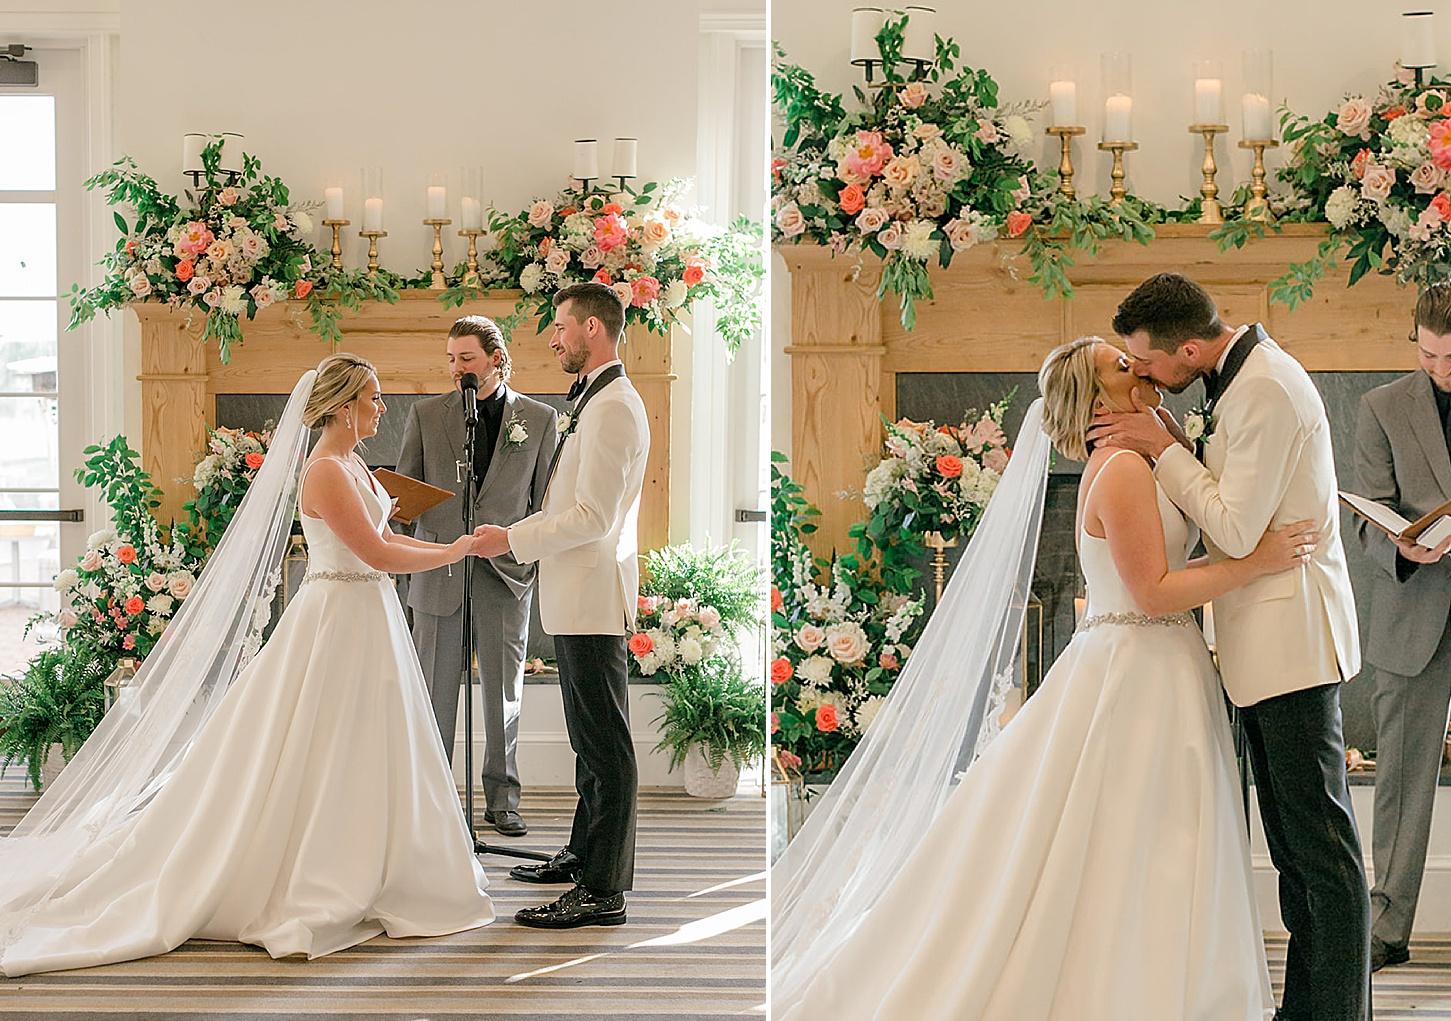 Linwood Country Club Summer Wedding Photography Studio by Magdalena Studios Jenn Kyle 0028